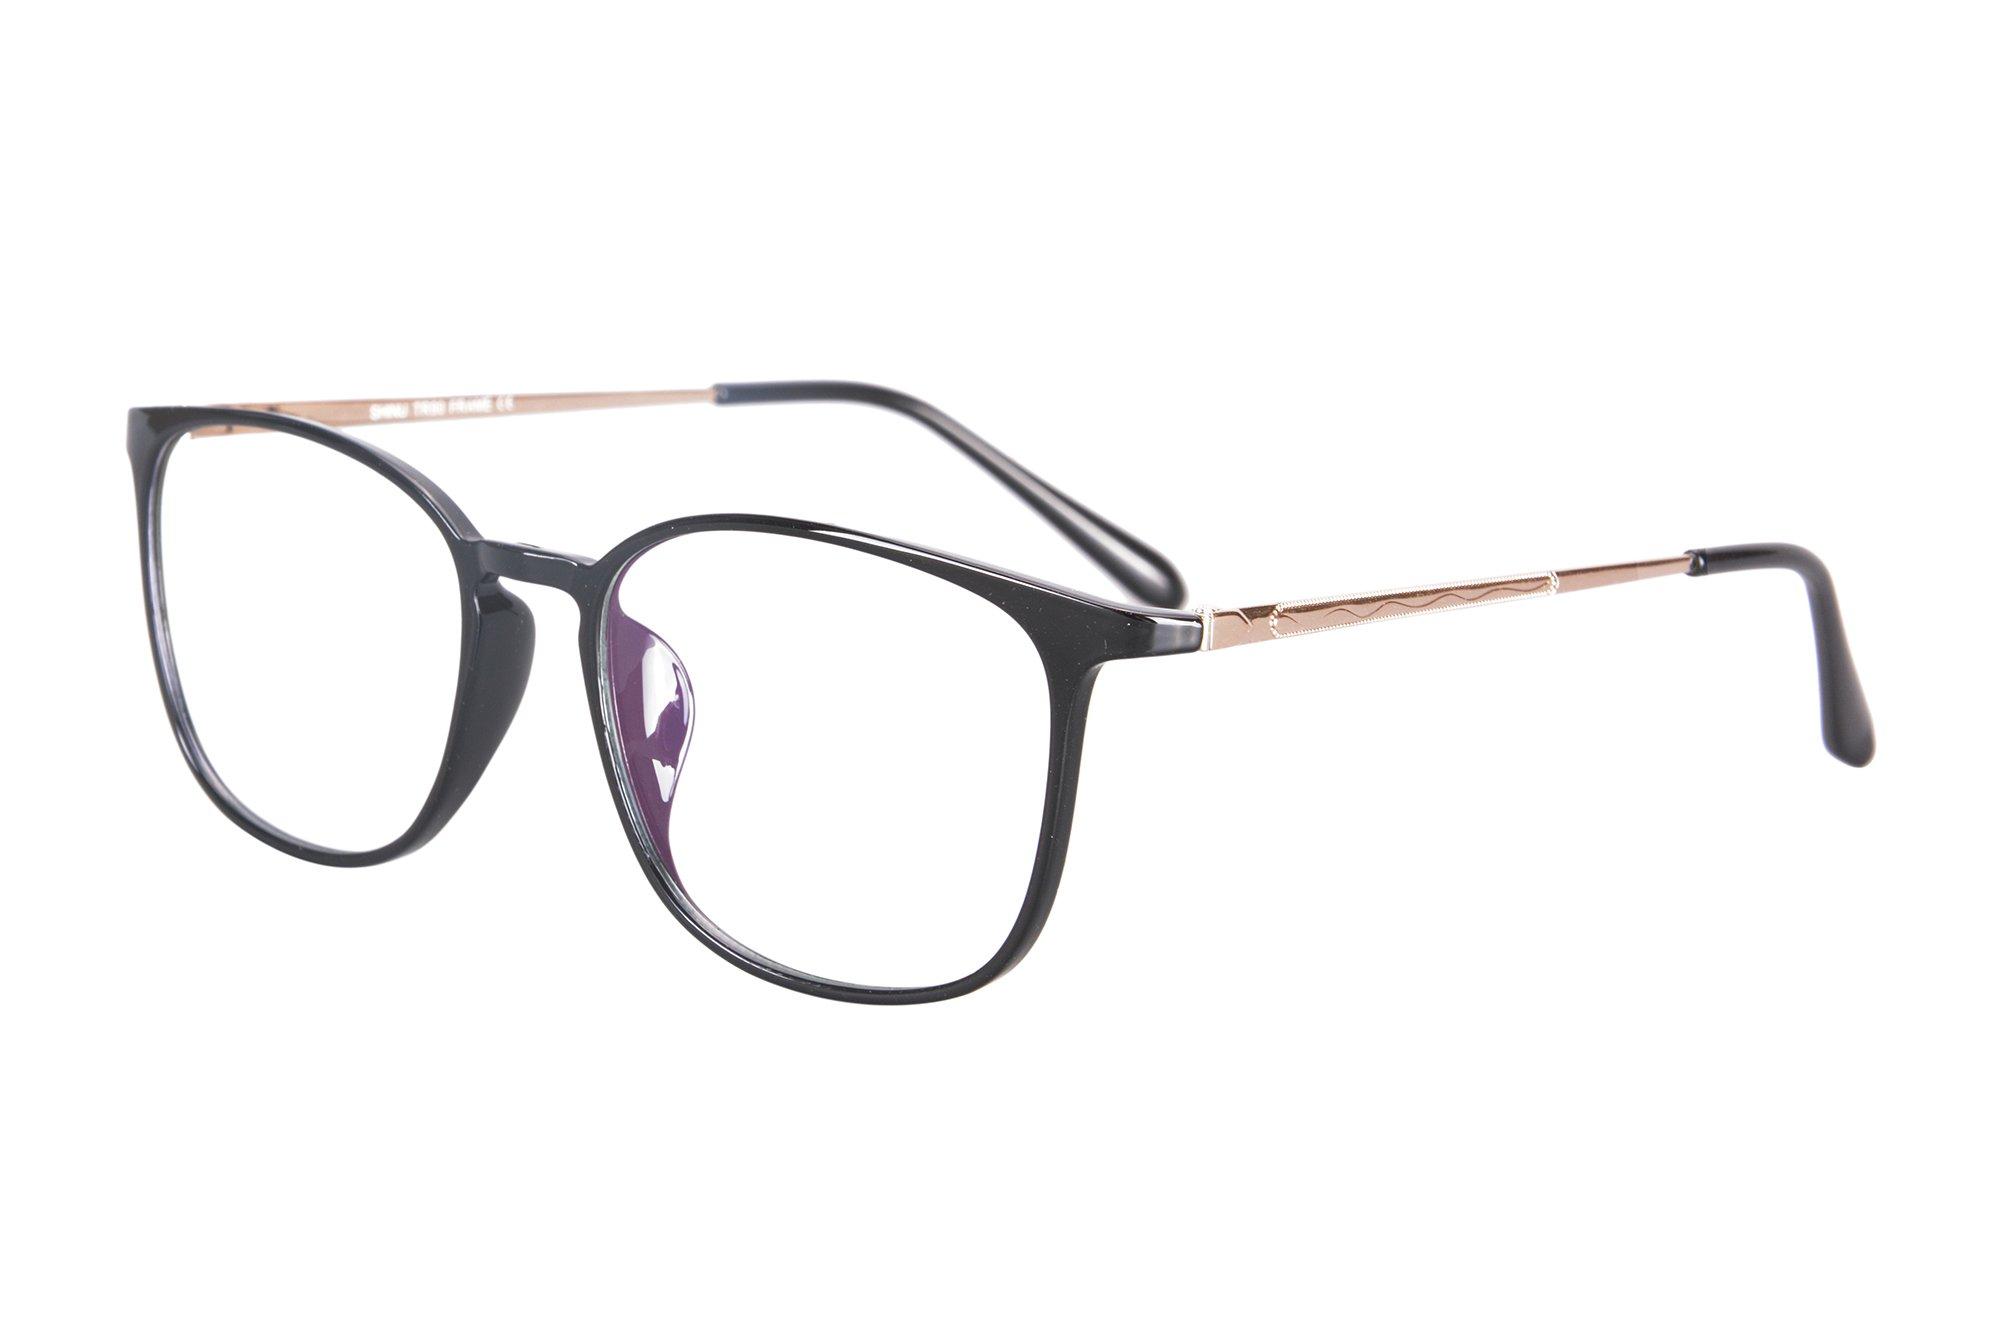 SHINU TR90/Metal Lightweight Frame Progressive Multifocus Anti-Blue Light Reading Glasses-SH022